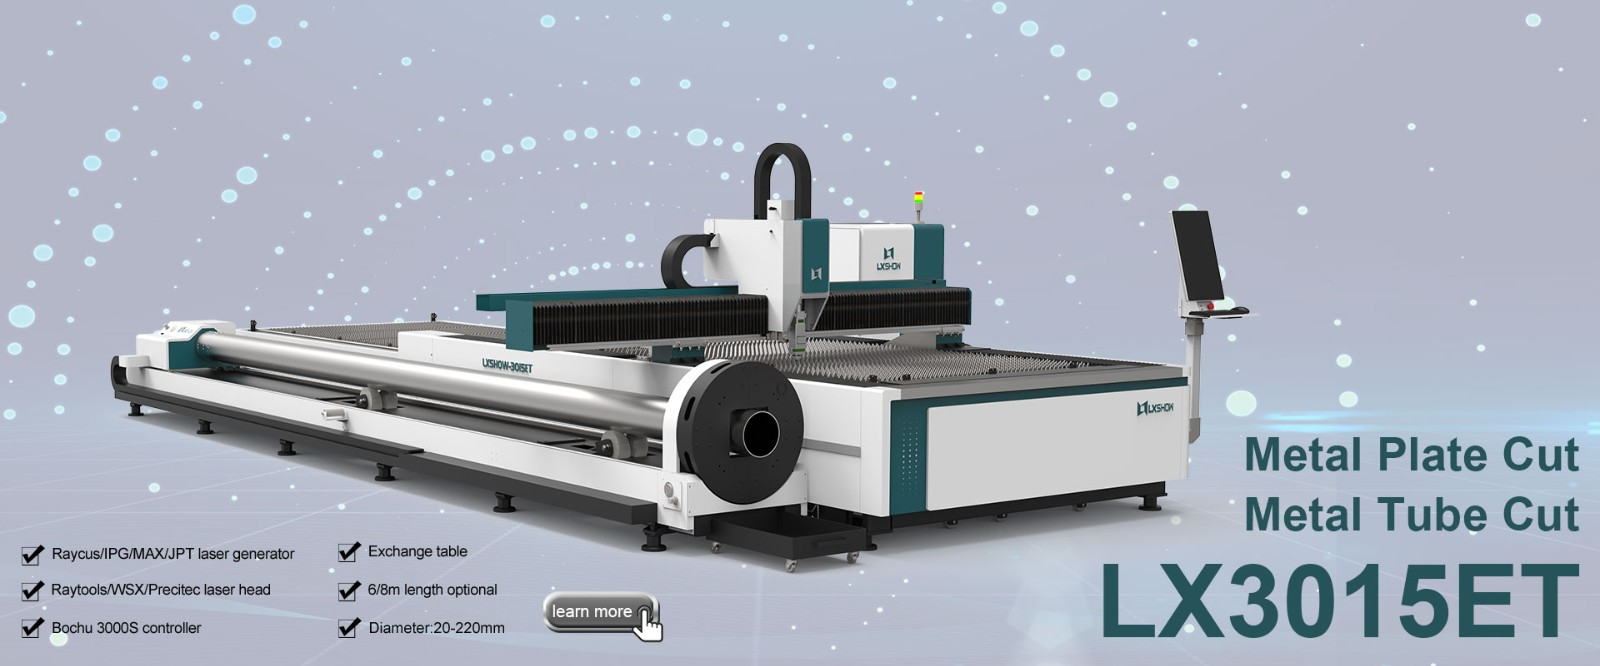 Sheet and Tube Laser Cutting Machine LX3015ET